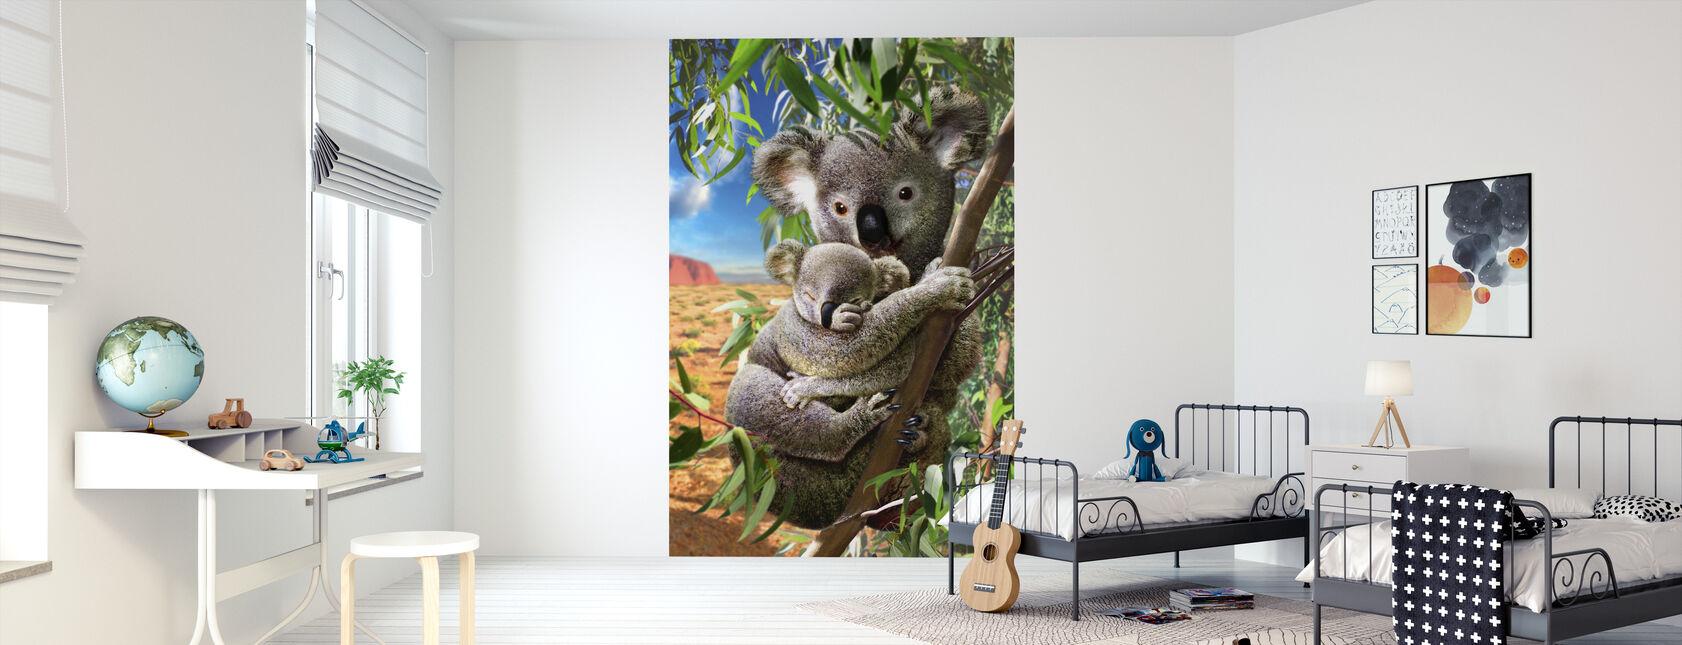 Koala and cub - Wallpaper - Kids Room